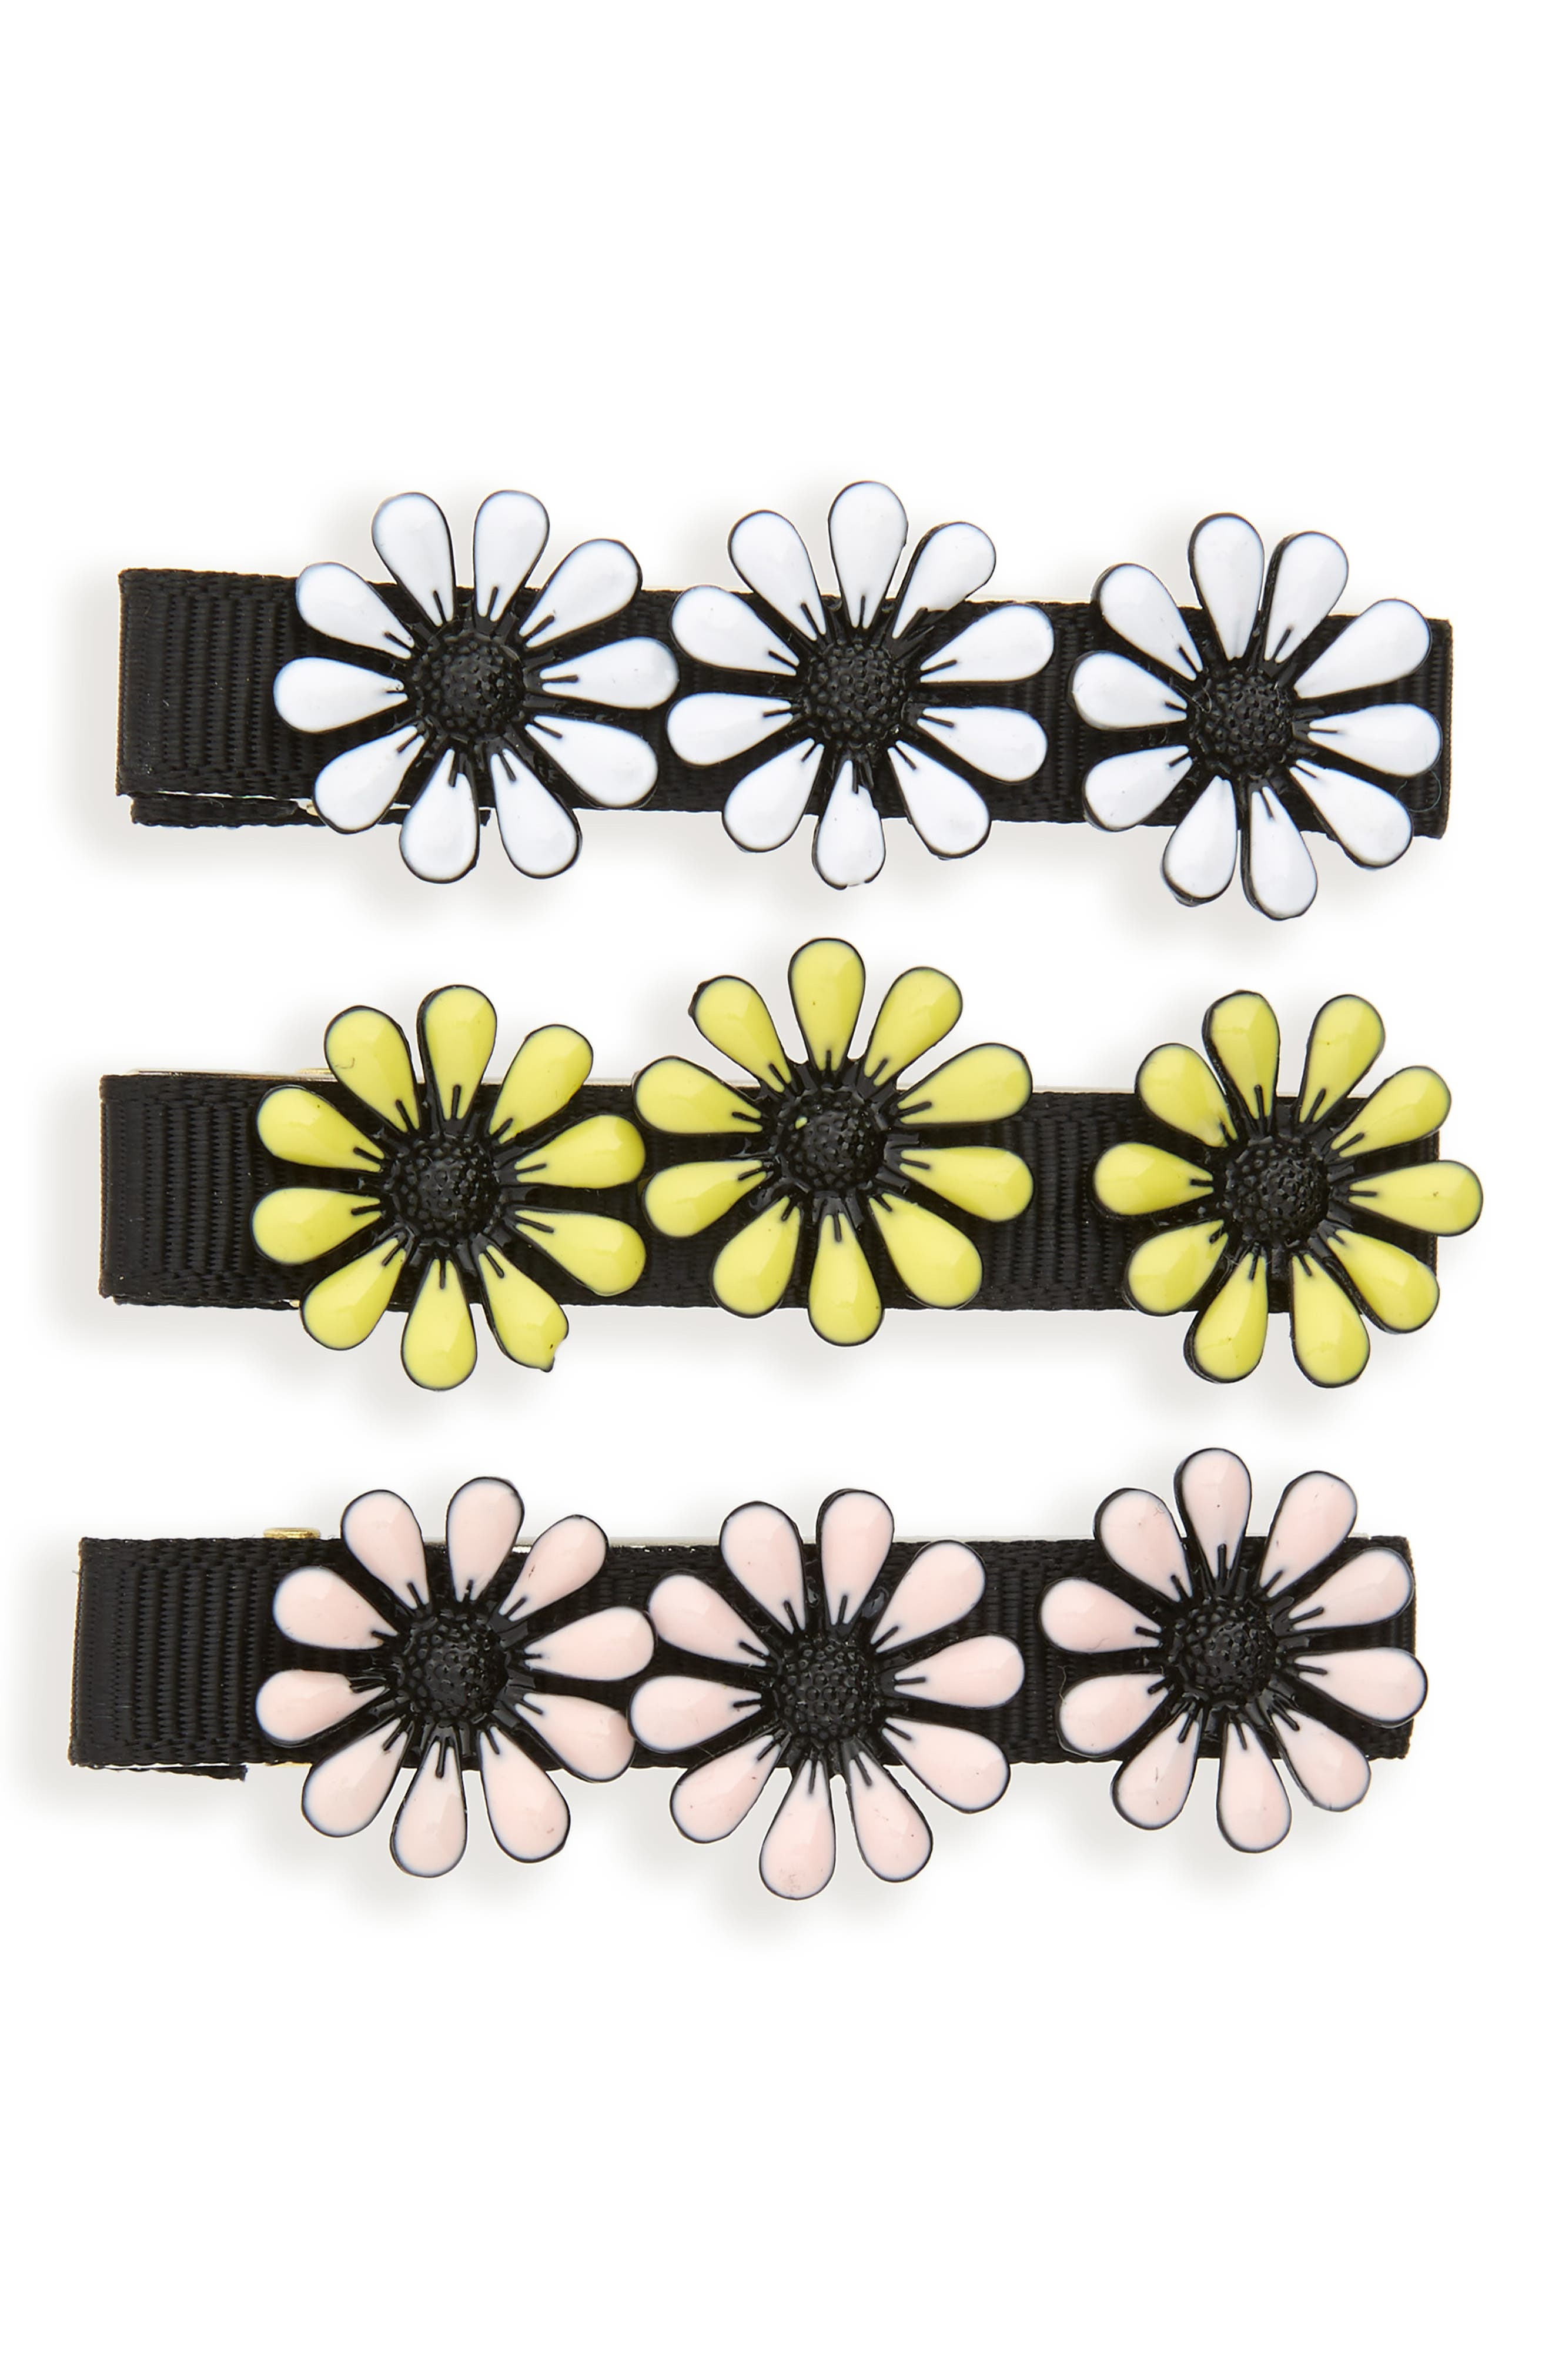 Set of 3 Enamel Daisy Hair Clips,                             Main thumbnail 1, color,                             001